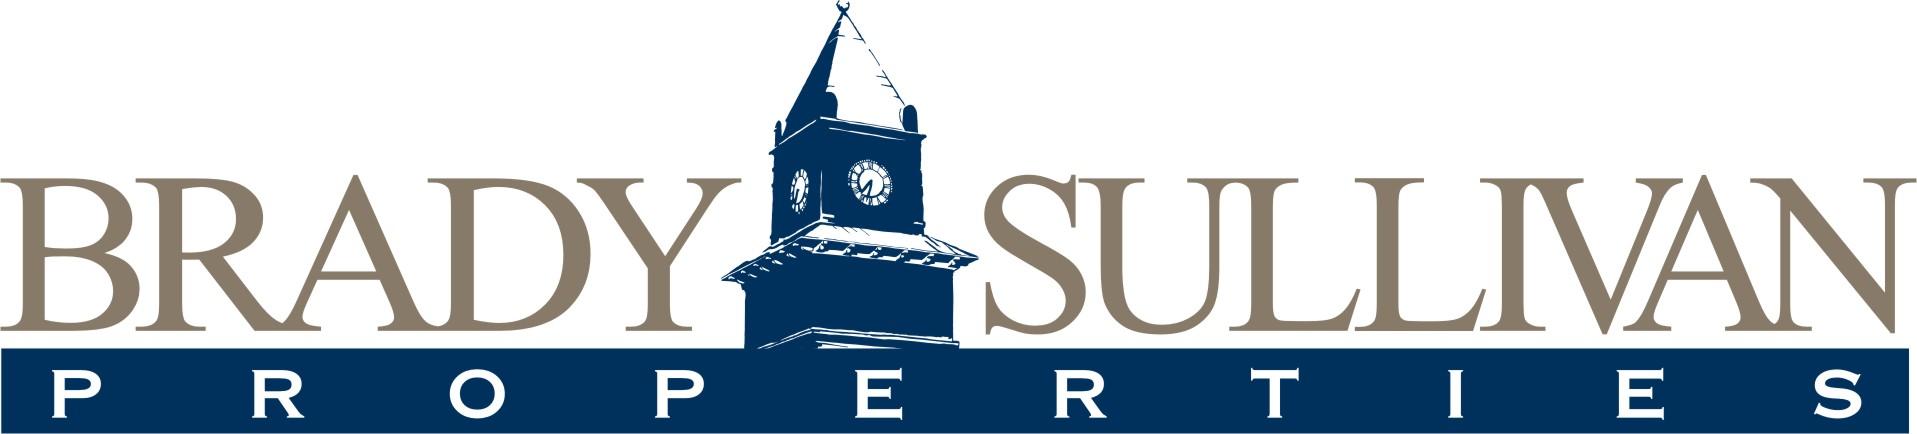 Brady Sullivan logo